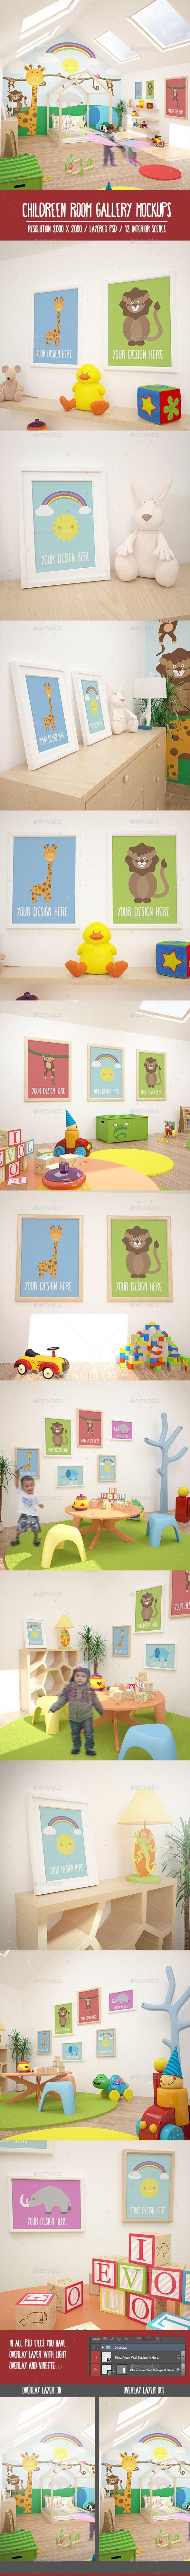 12 Children Room Gallery MockUPs Pack - Product Mock-Ups Graphics